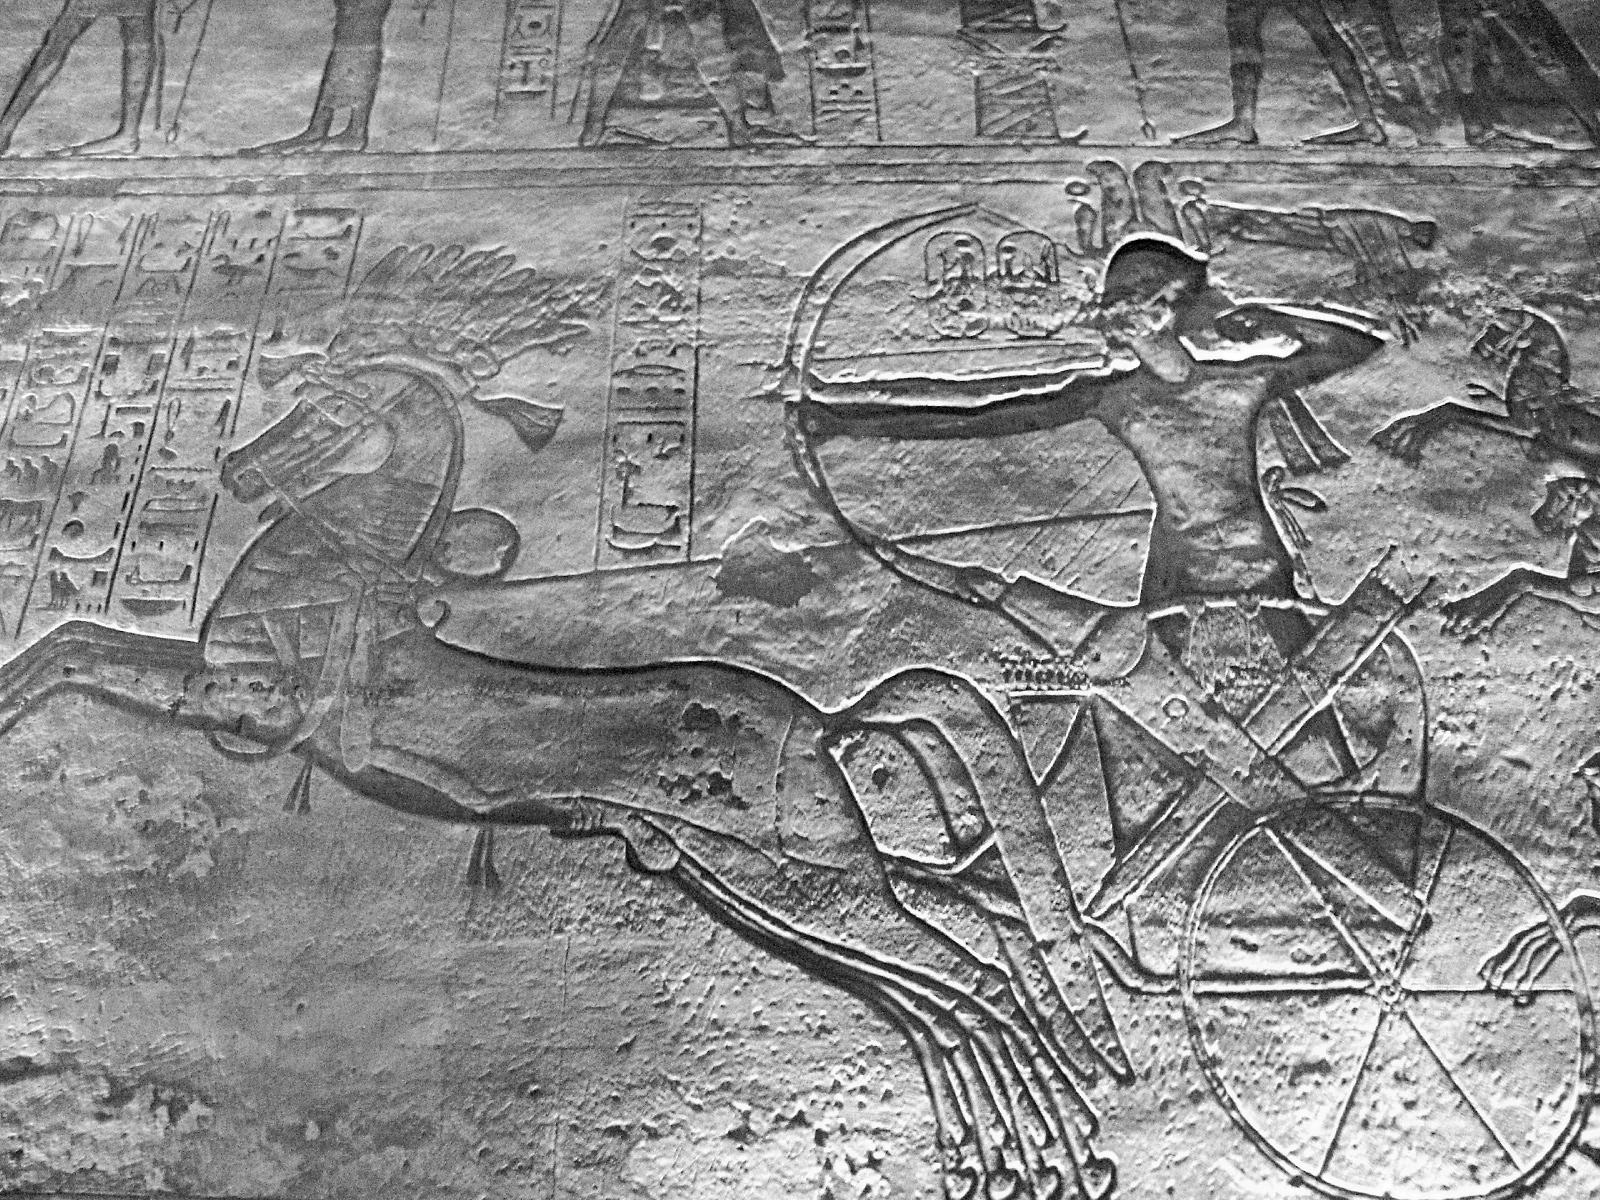 https://upload.wikimedia.org/wikipedia/commons/a/ae/Egypt_Abou_Simbel1.jpg